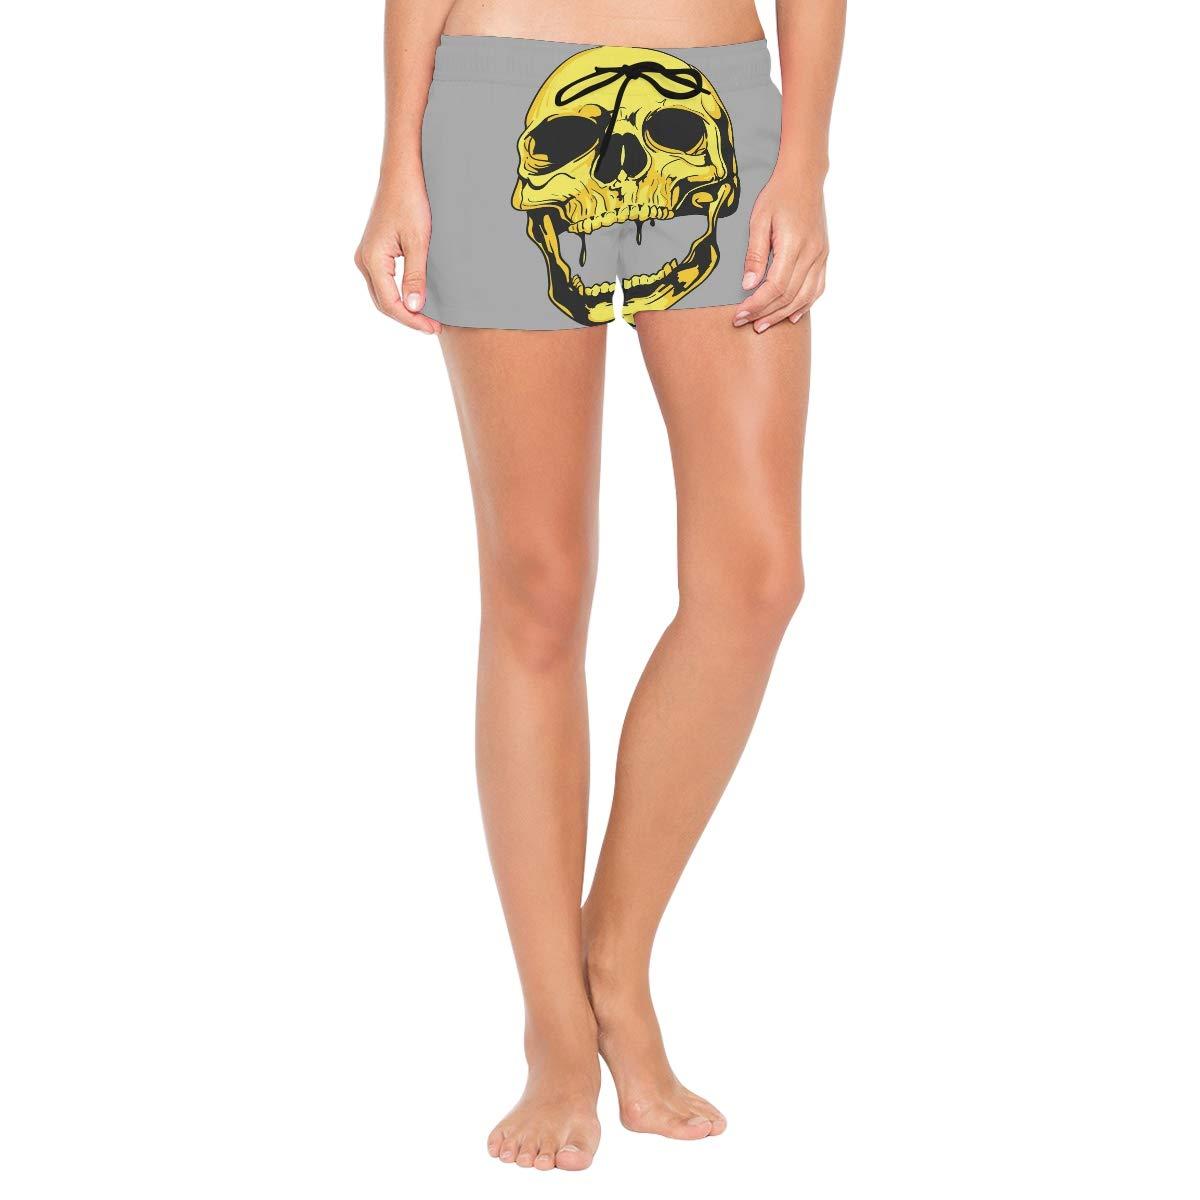 DEZIRO Golden Skeleton Surf Womens Breeze Boardshort Swim Shorts